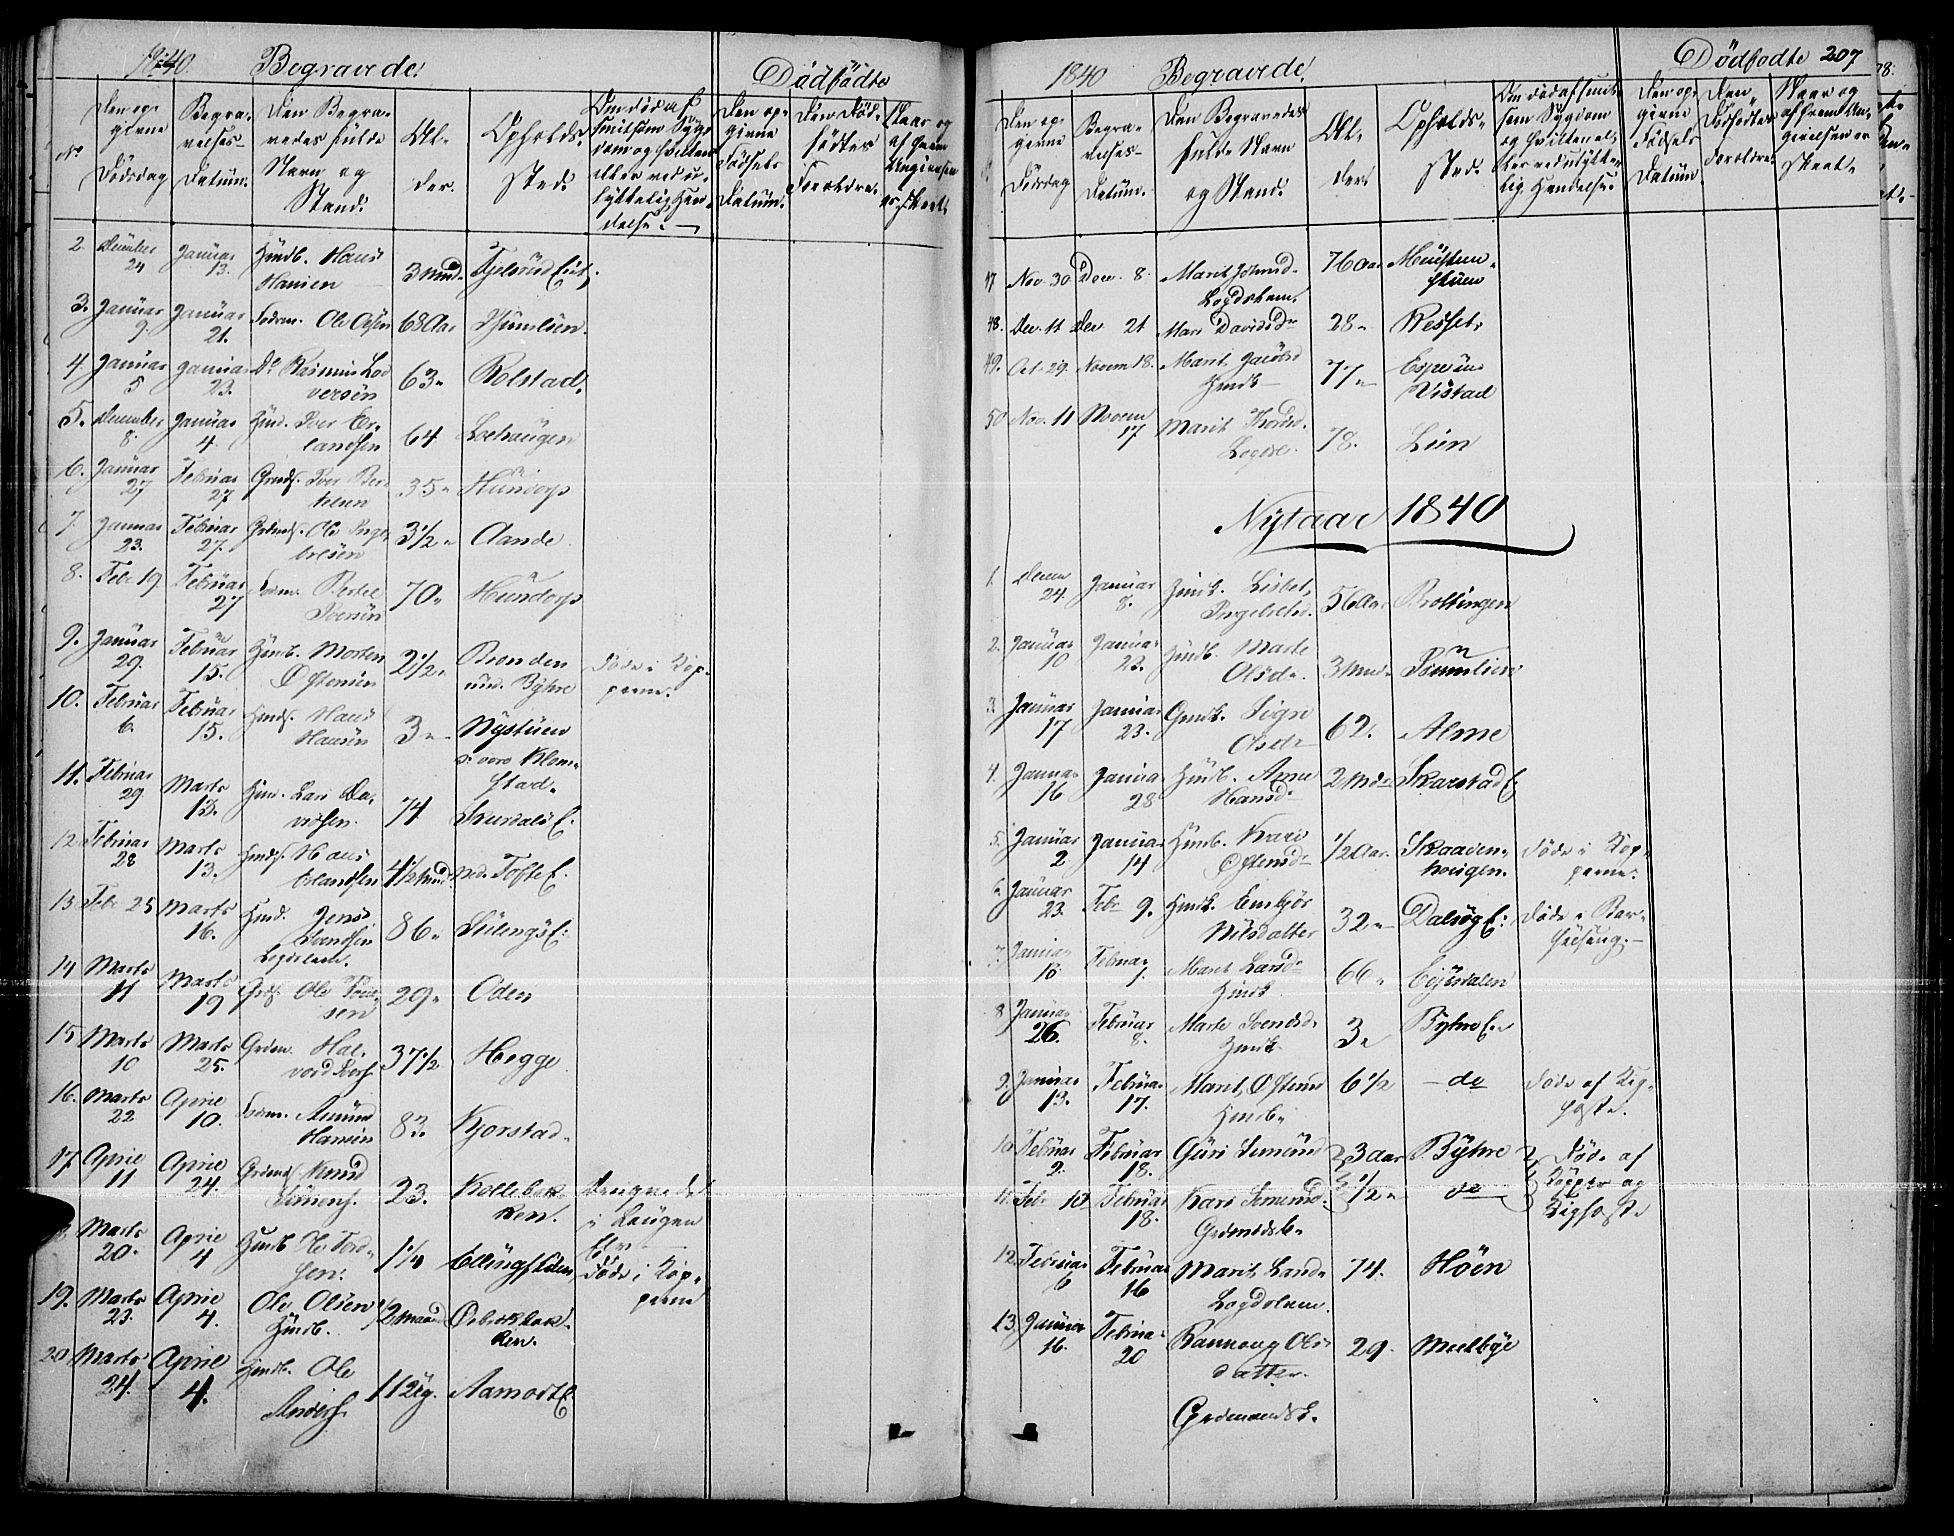 SAH, Fron prestekontor, H/Ha/Haa/L0004: Ministerialbok nr. 4, 1839-1848, s. 207